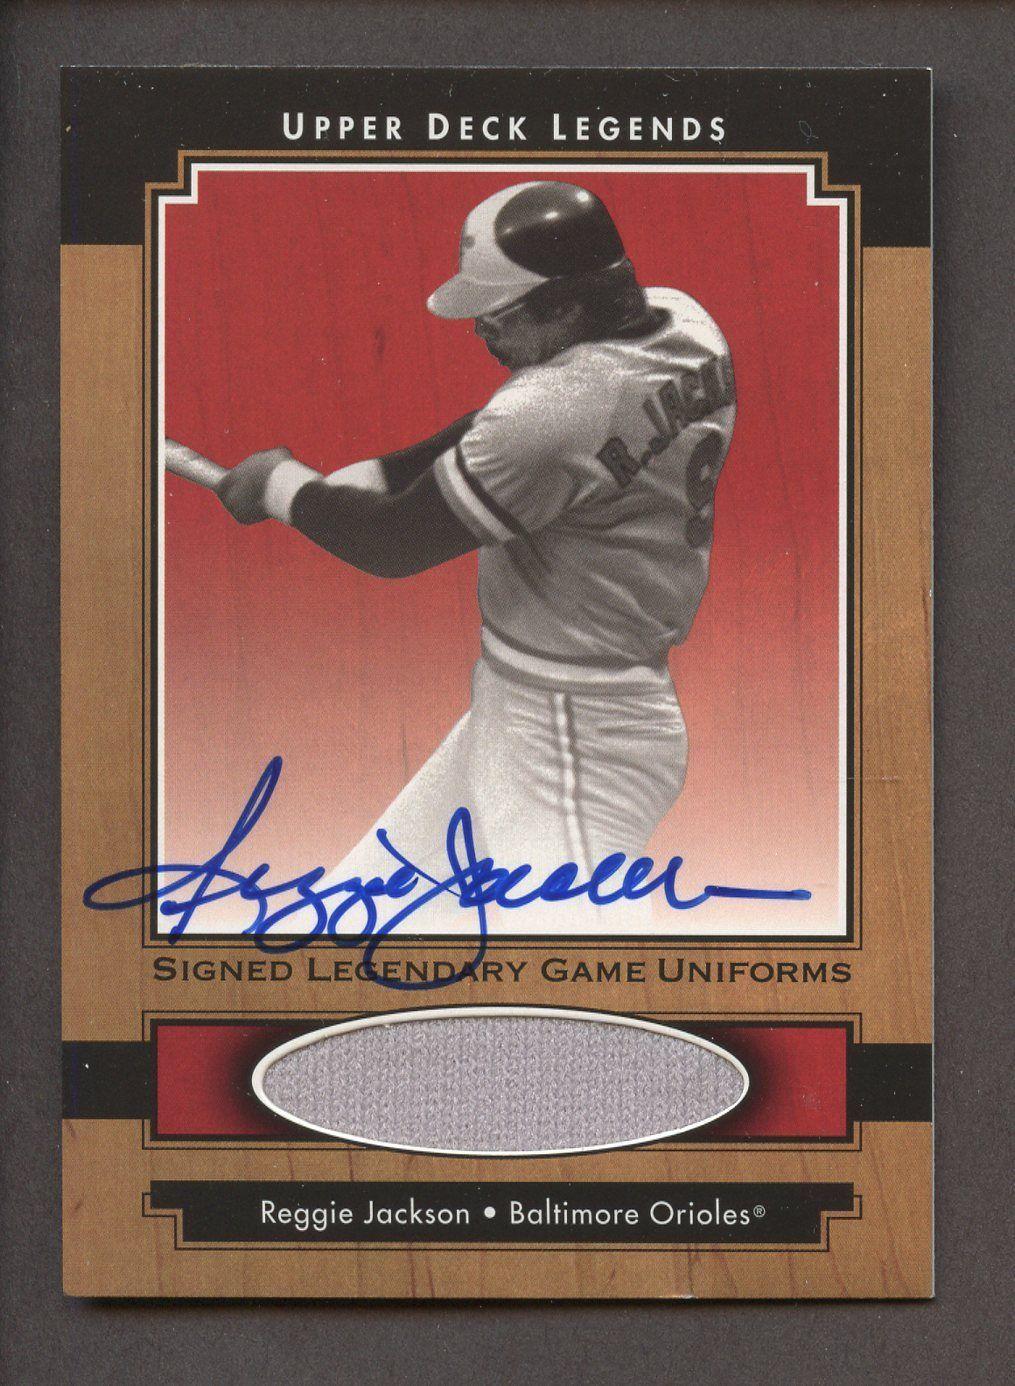 d28449926 2001 Upper Deck Legends Game Uniform Reggie Jackson Jersey AUTO   BaseballCards